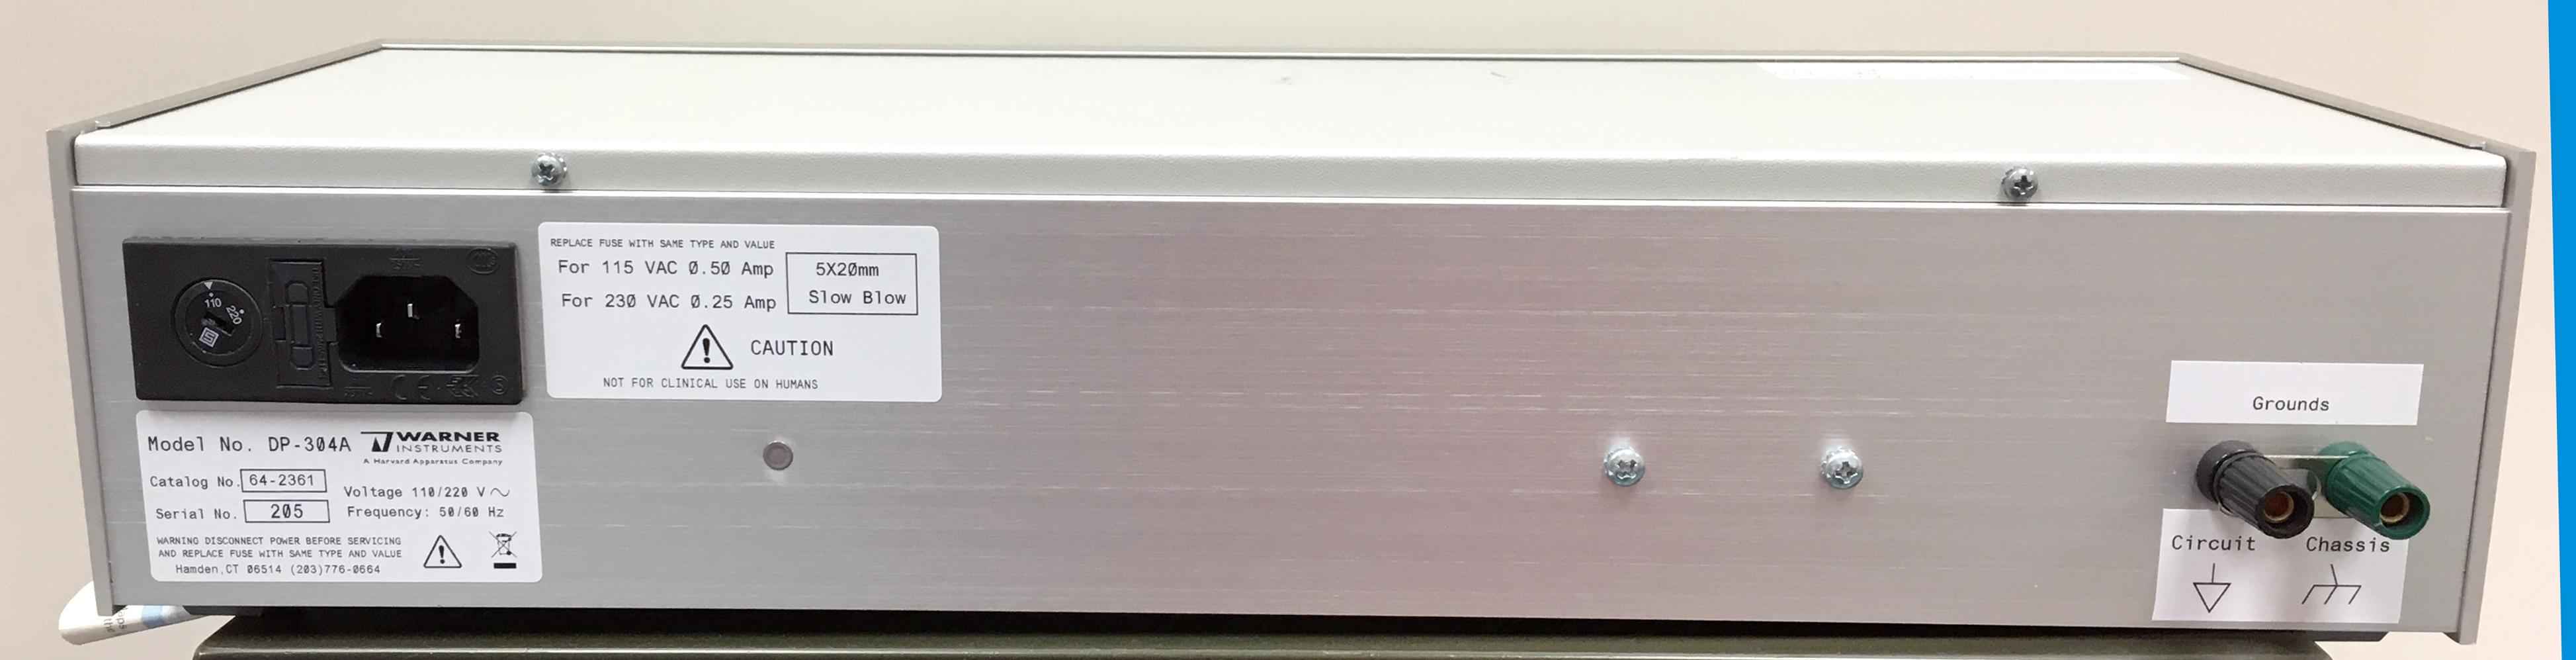 Differential Amplifier (DP-304A)